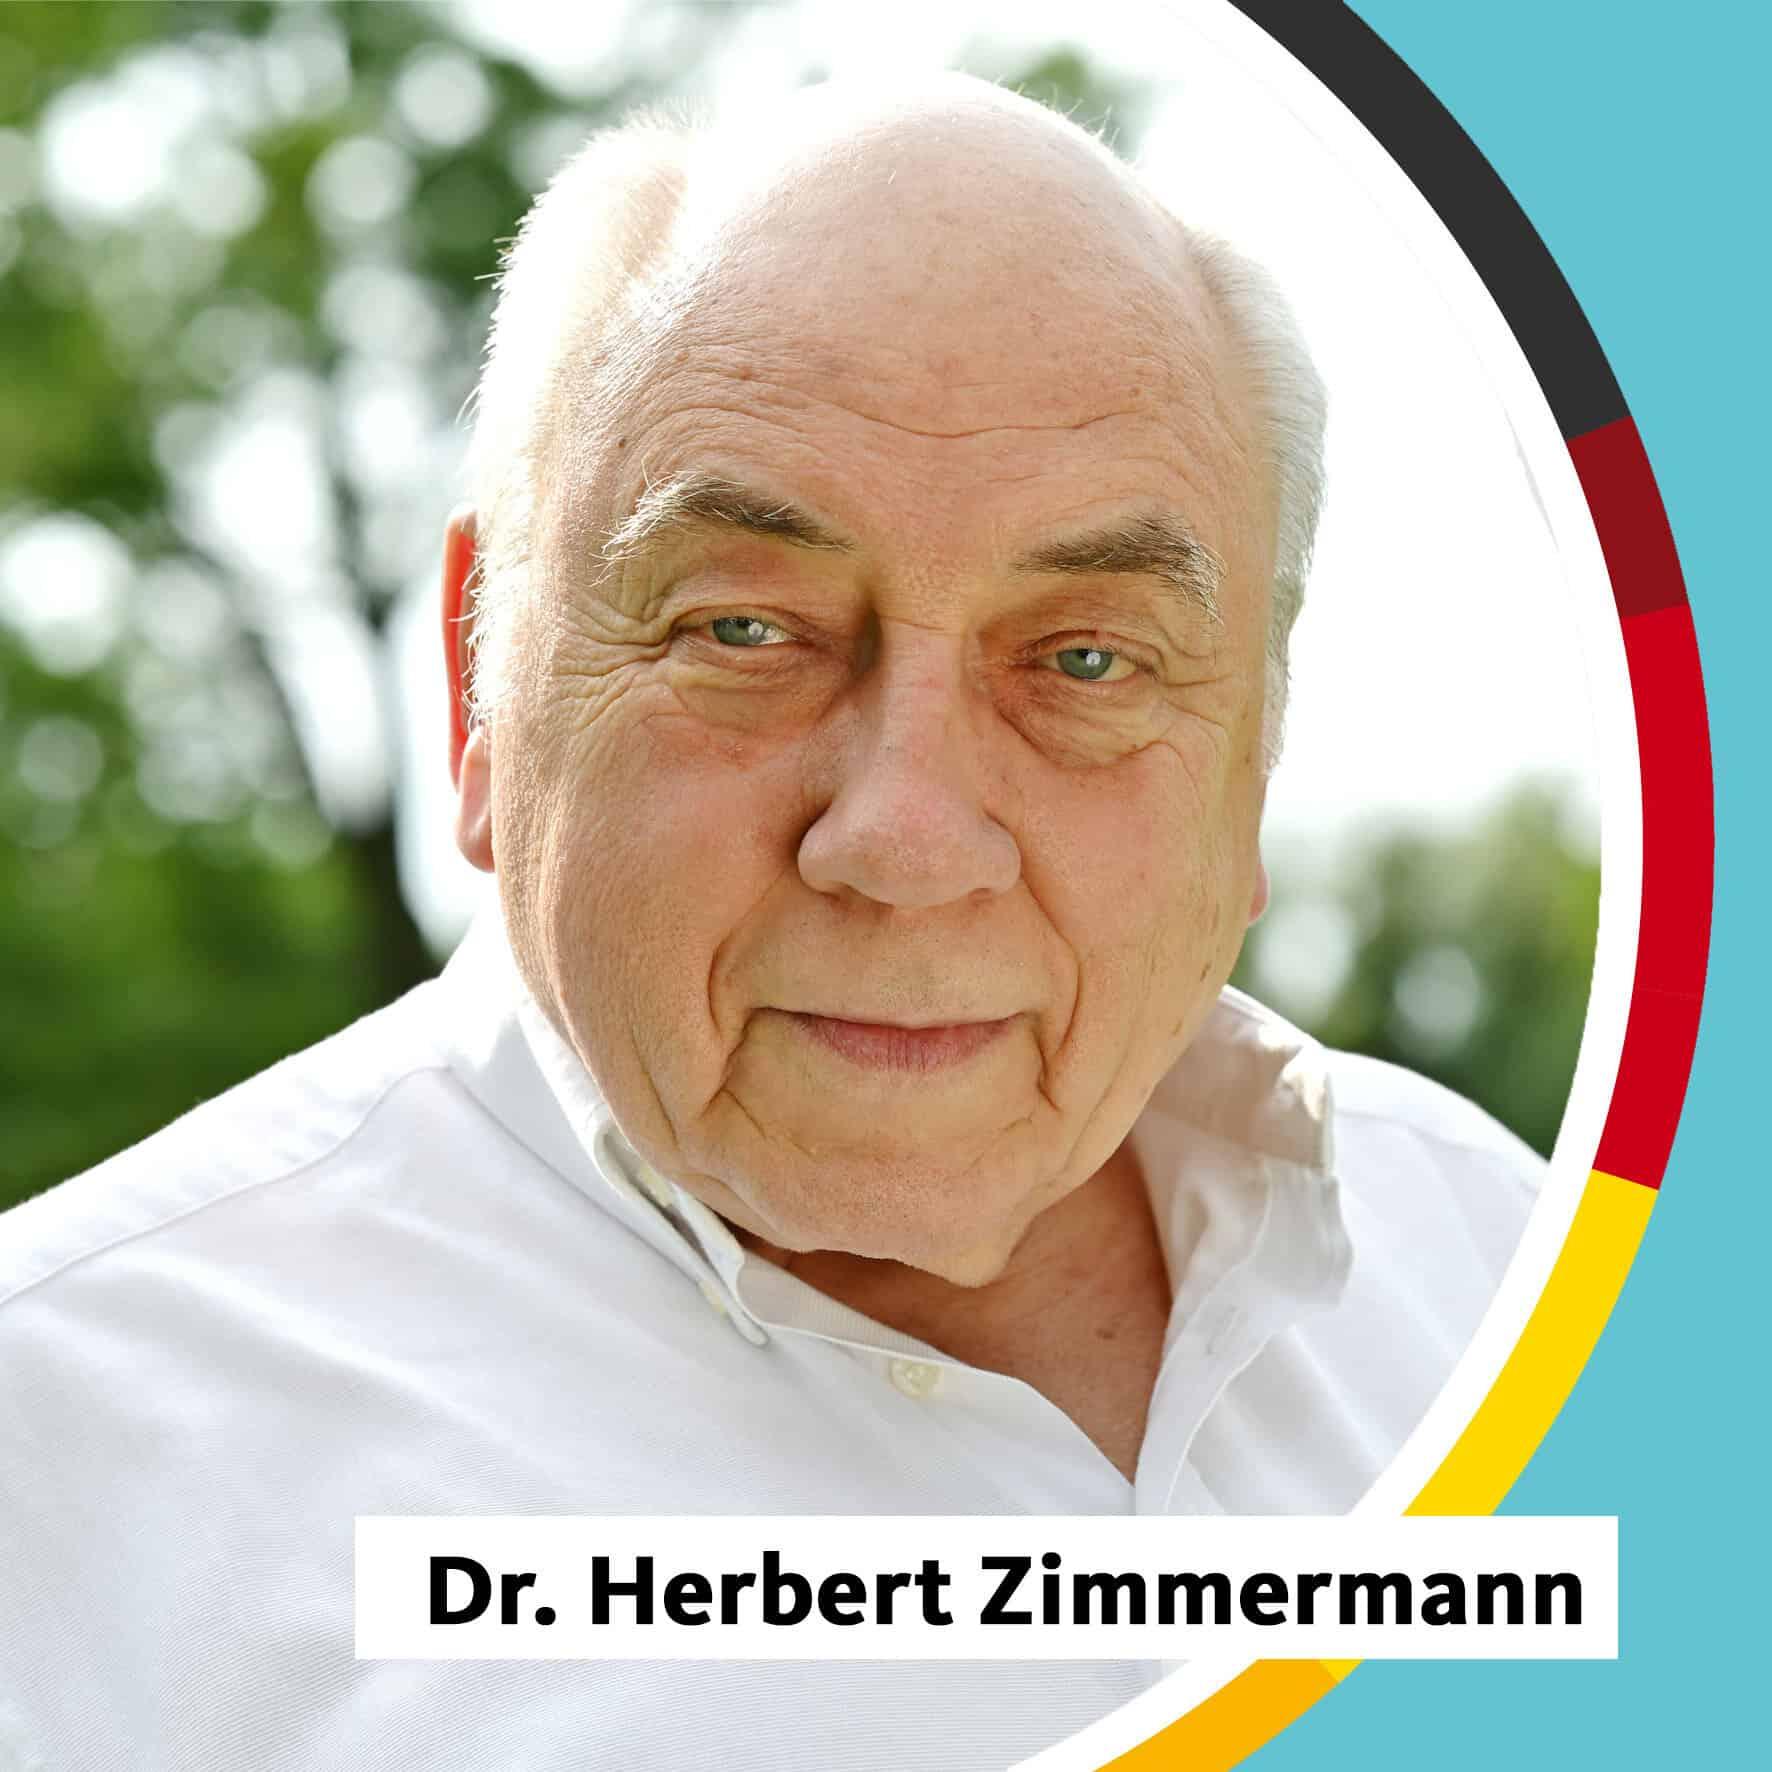 Dr. HErbert Zimmermann FB